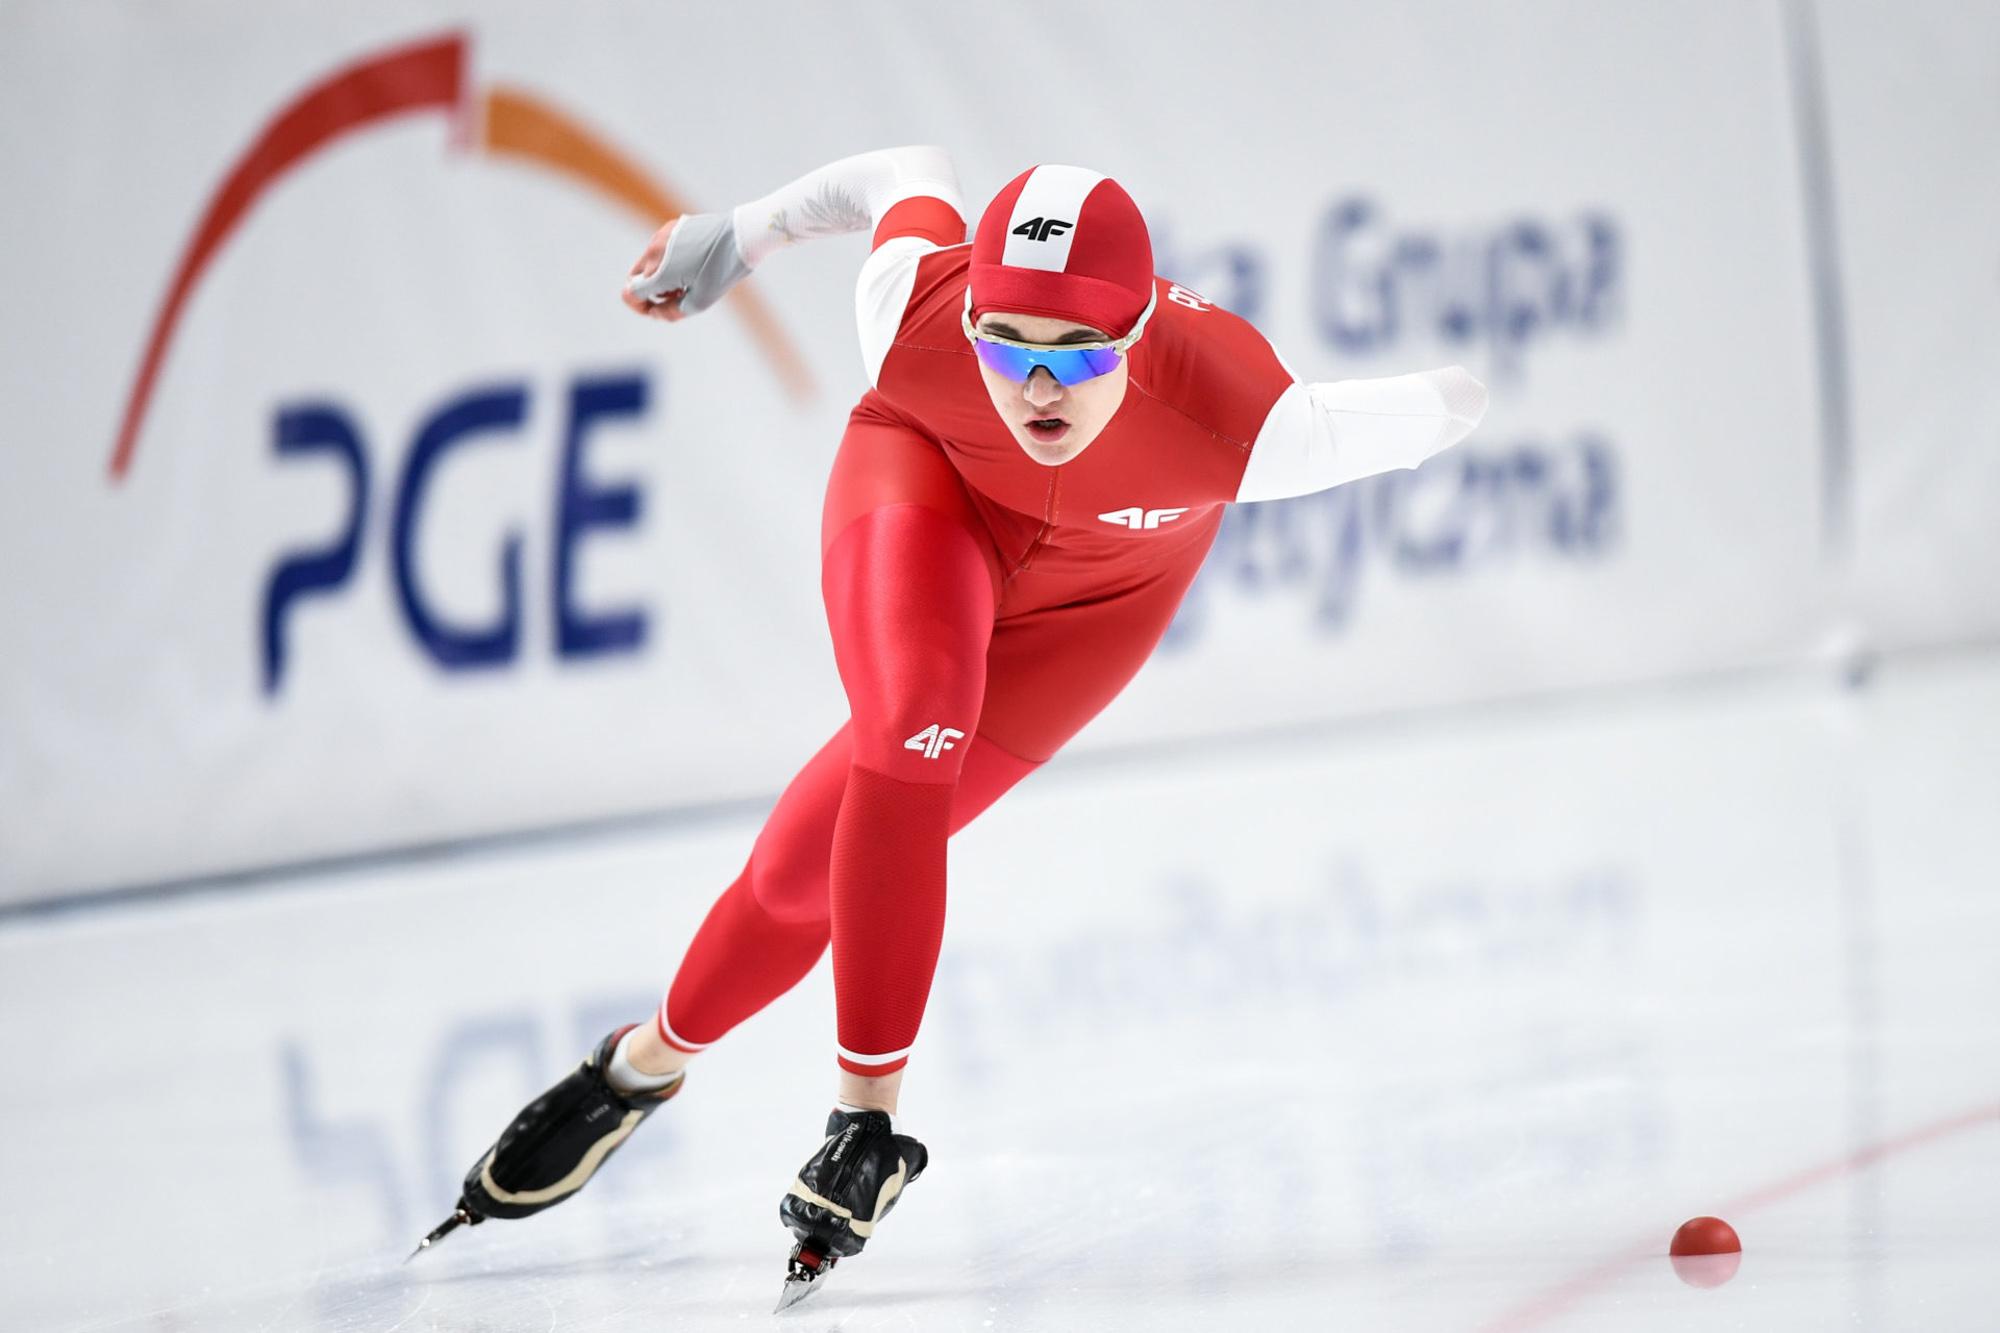 mistrzostwa  Polski w iweloboju sprinterskim 2019